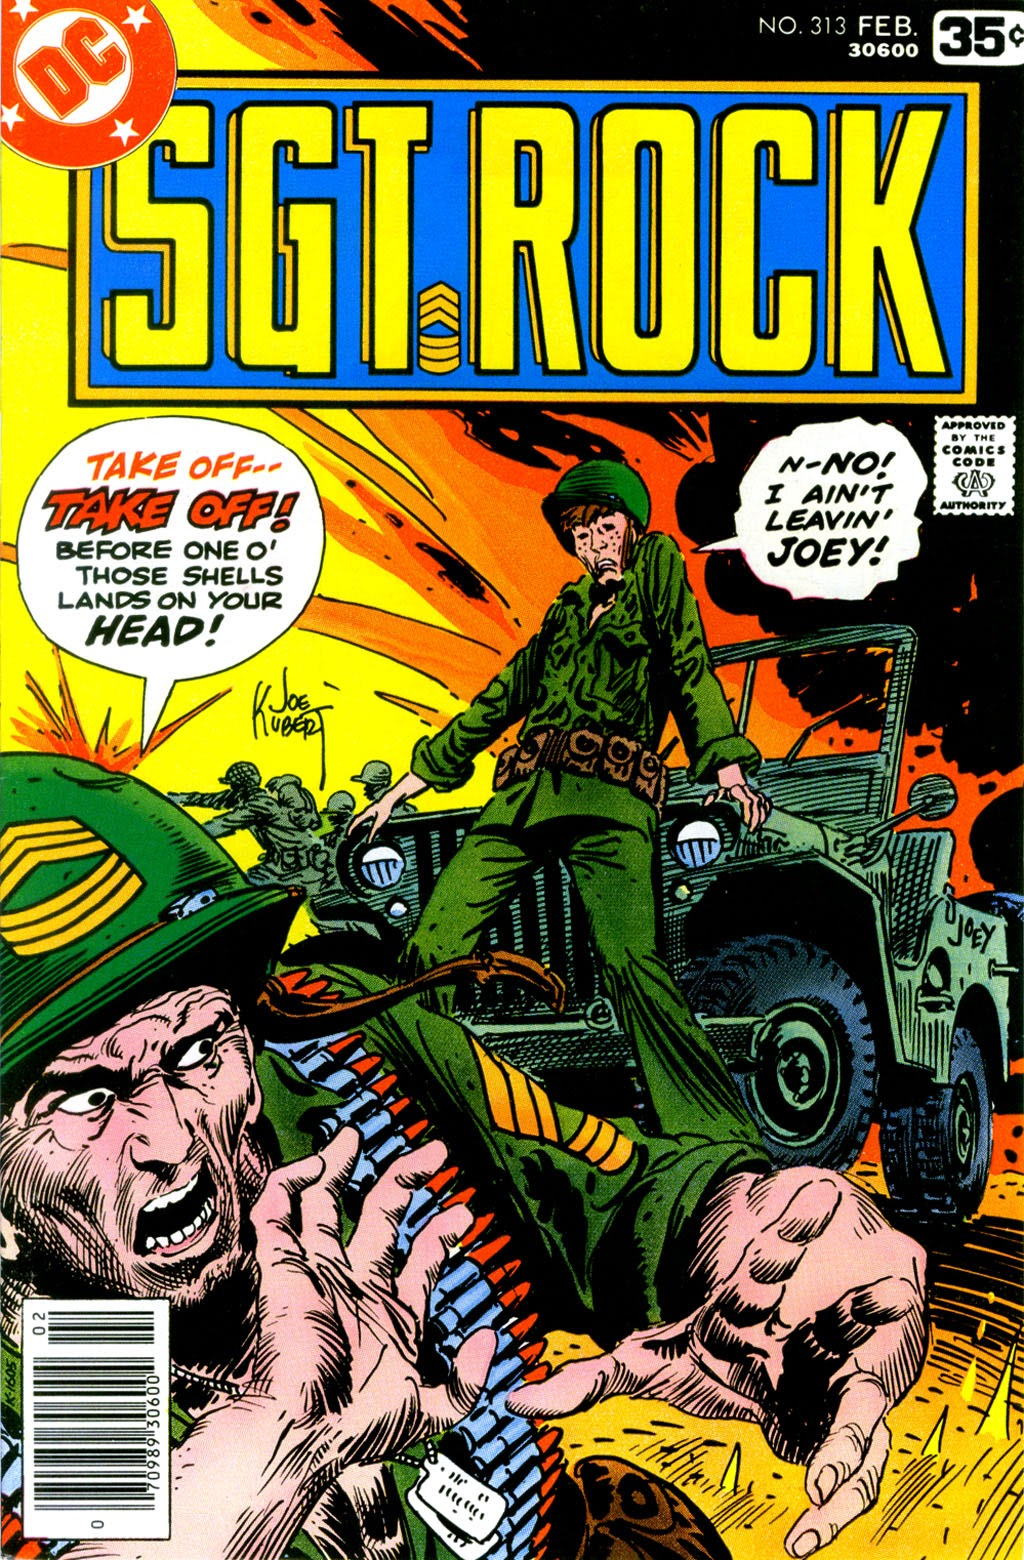 Read online Sgt. Rock comic -  Issue #313 - 1